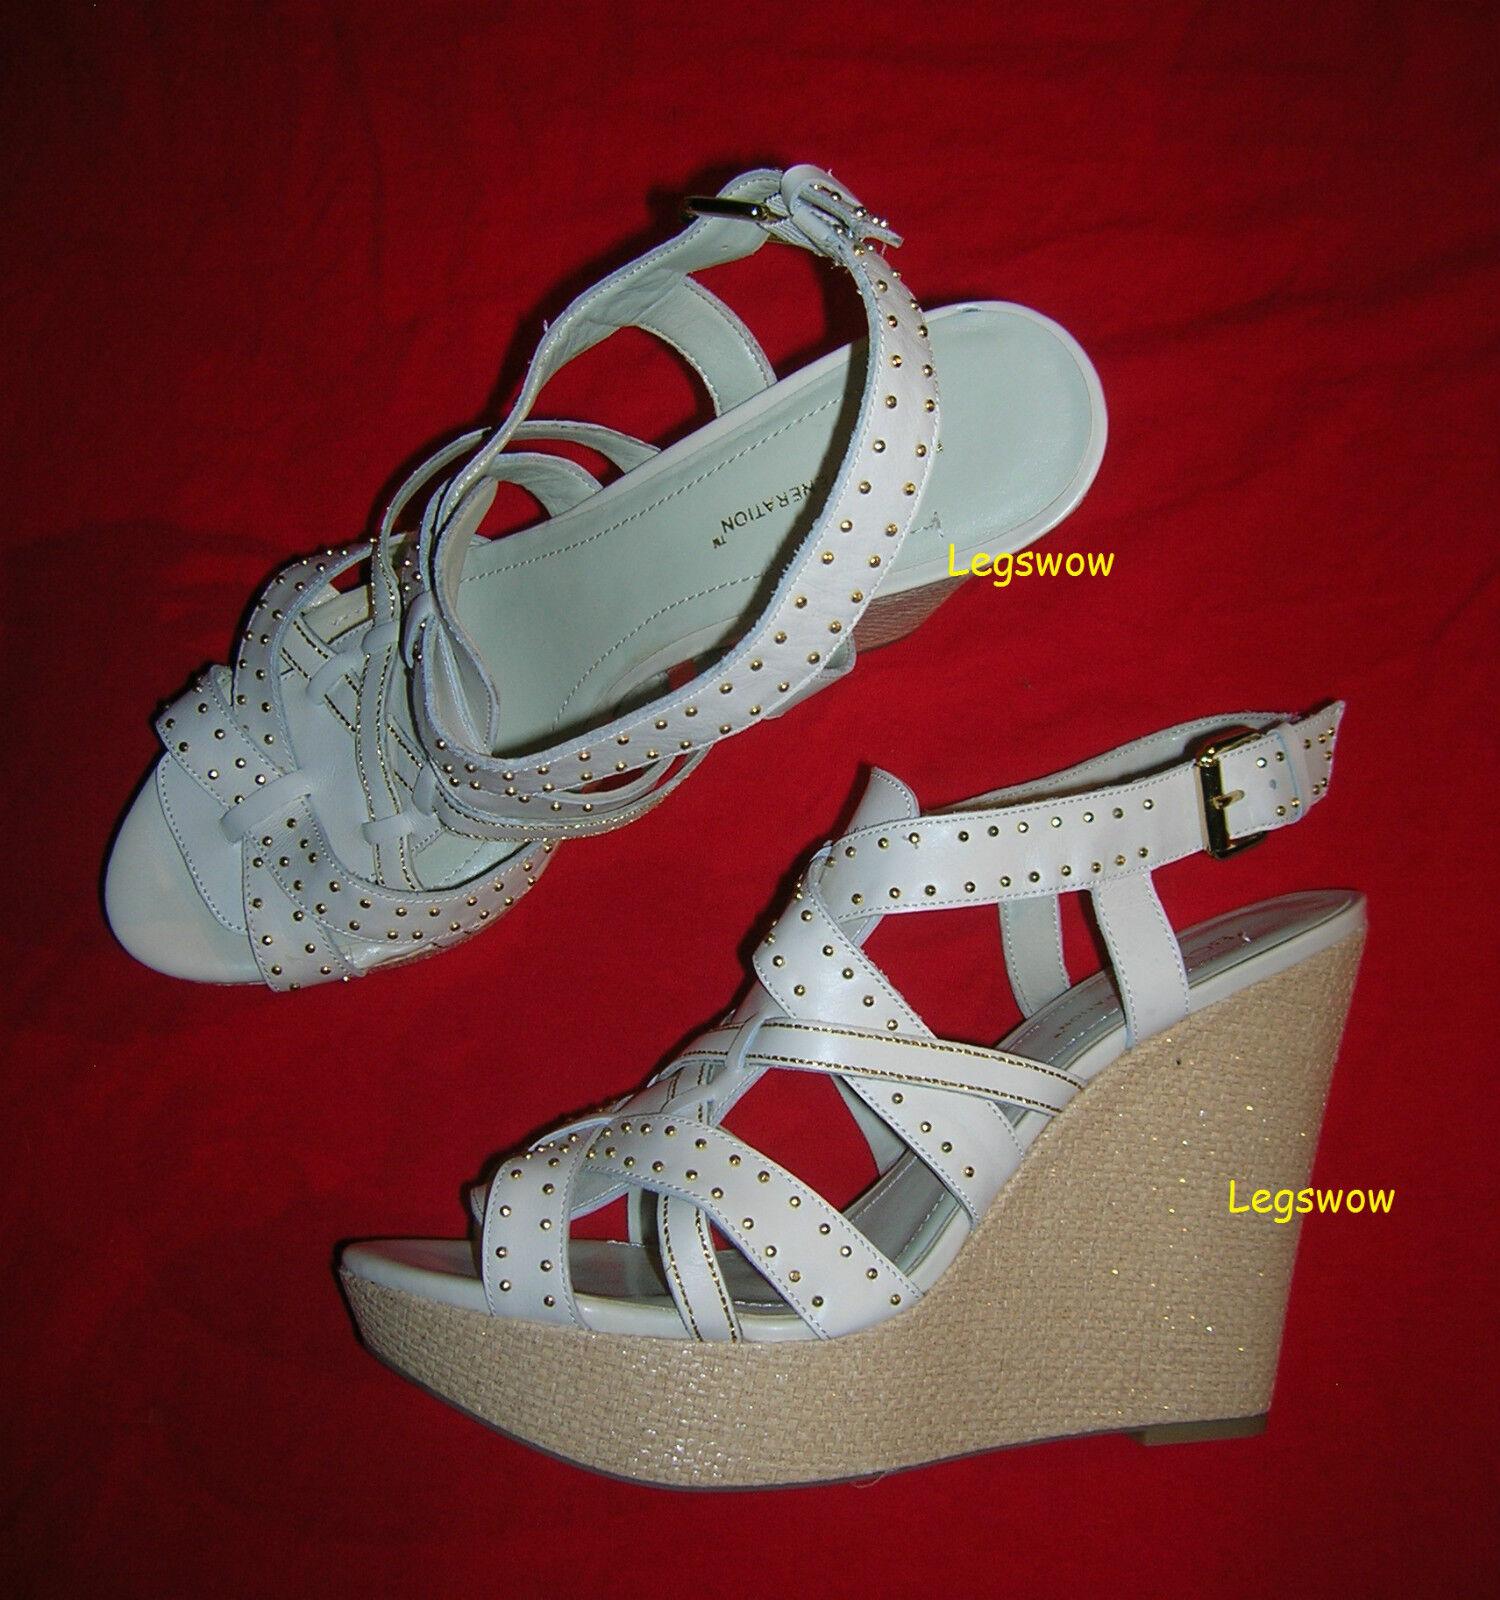 BCBG BCBGenartion 5    Wedge Heel Leather shoes Womens 10 Sandal shoes Cream Studded 85f27d